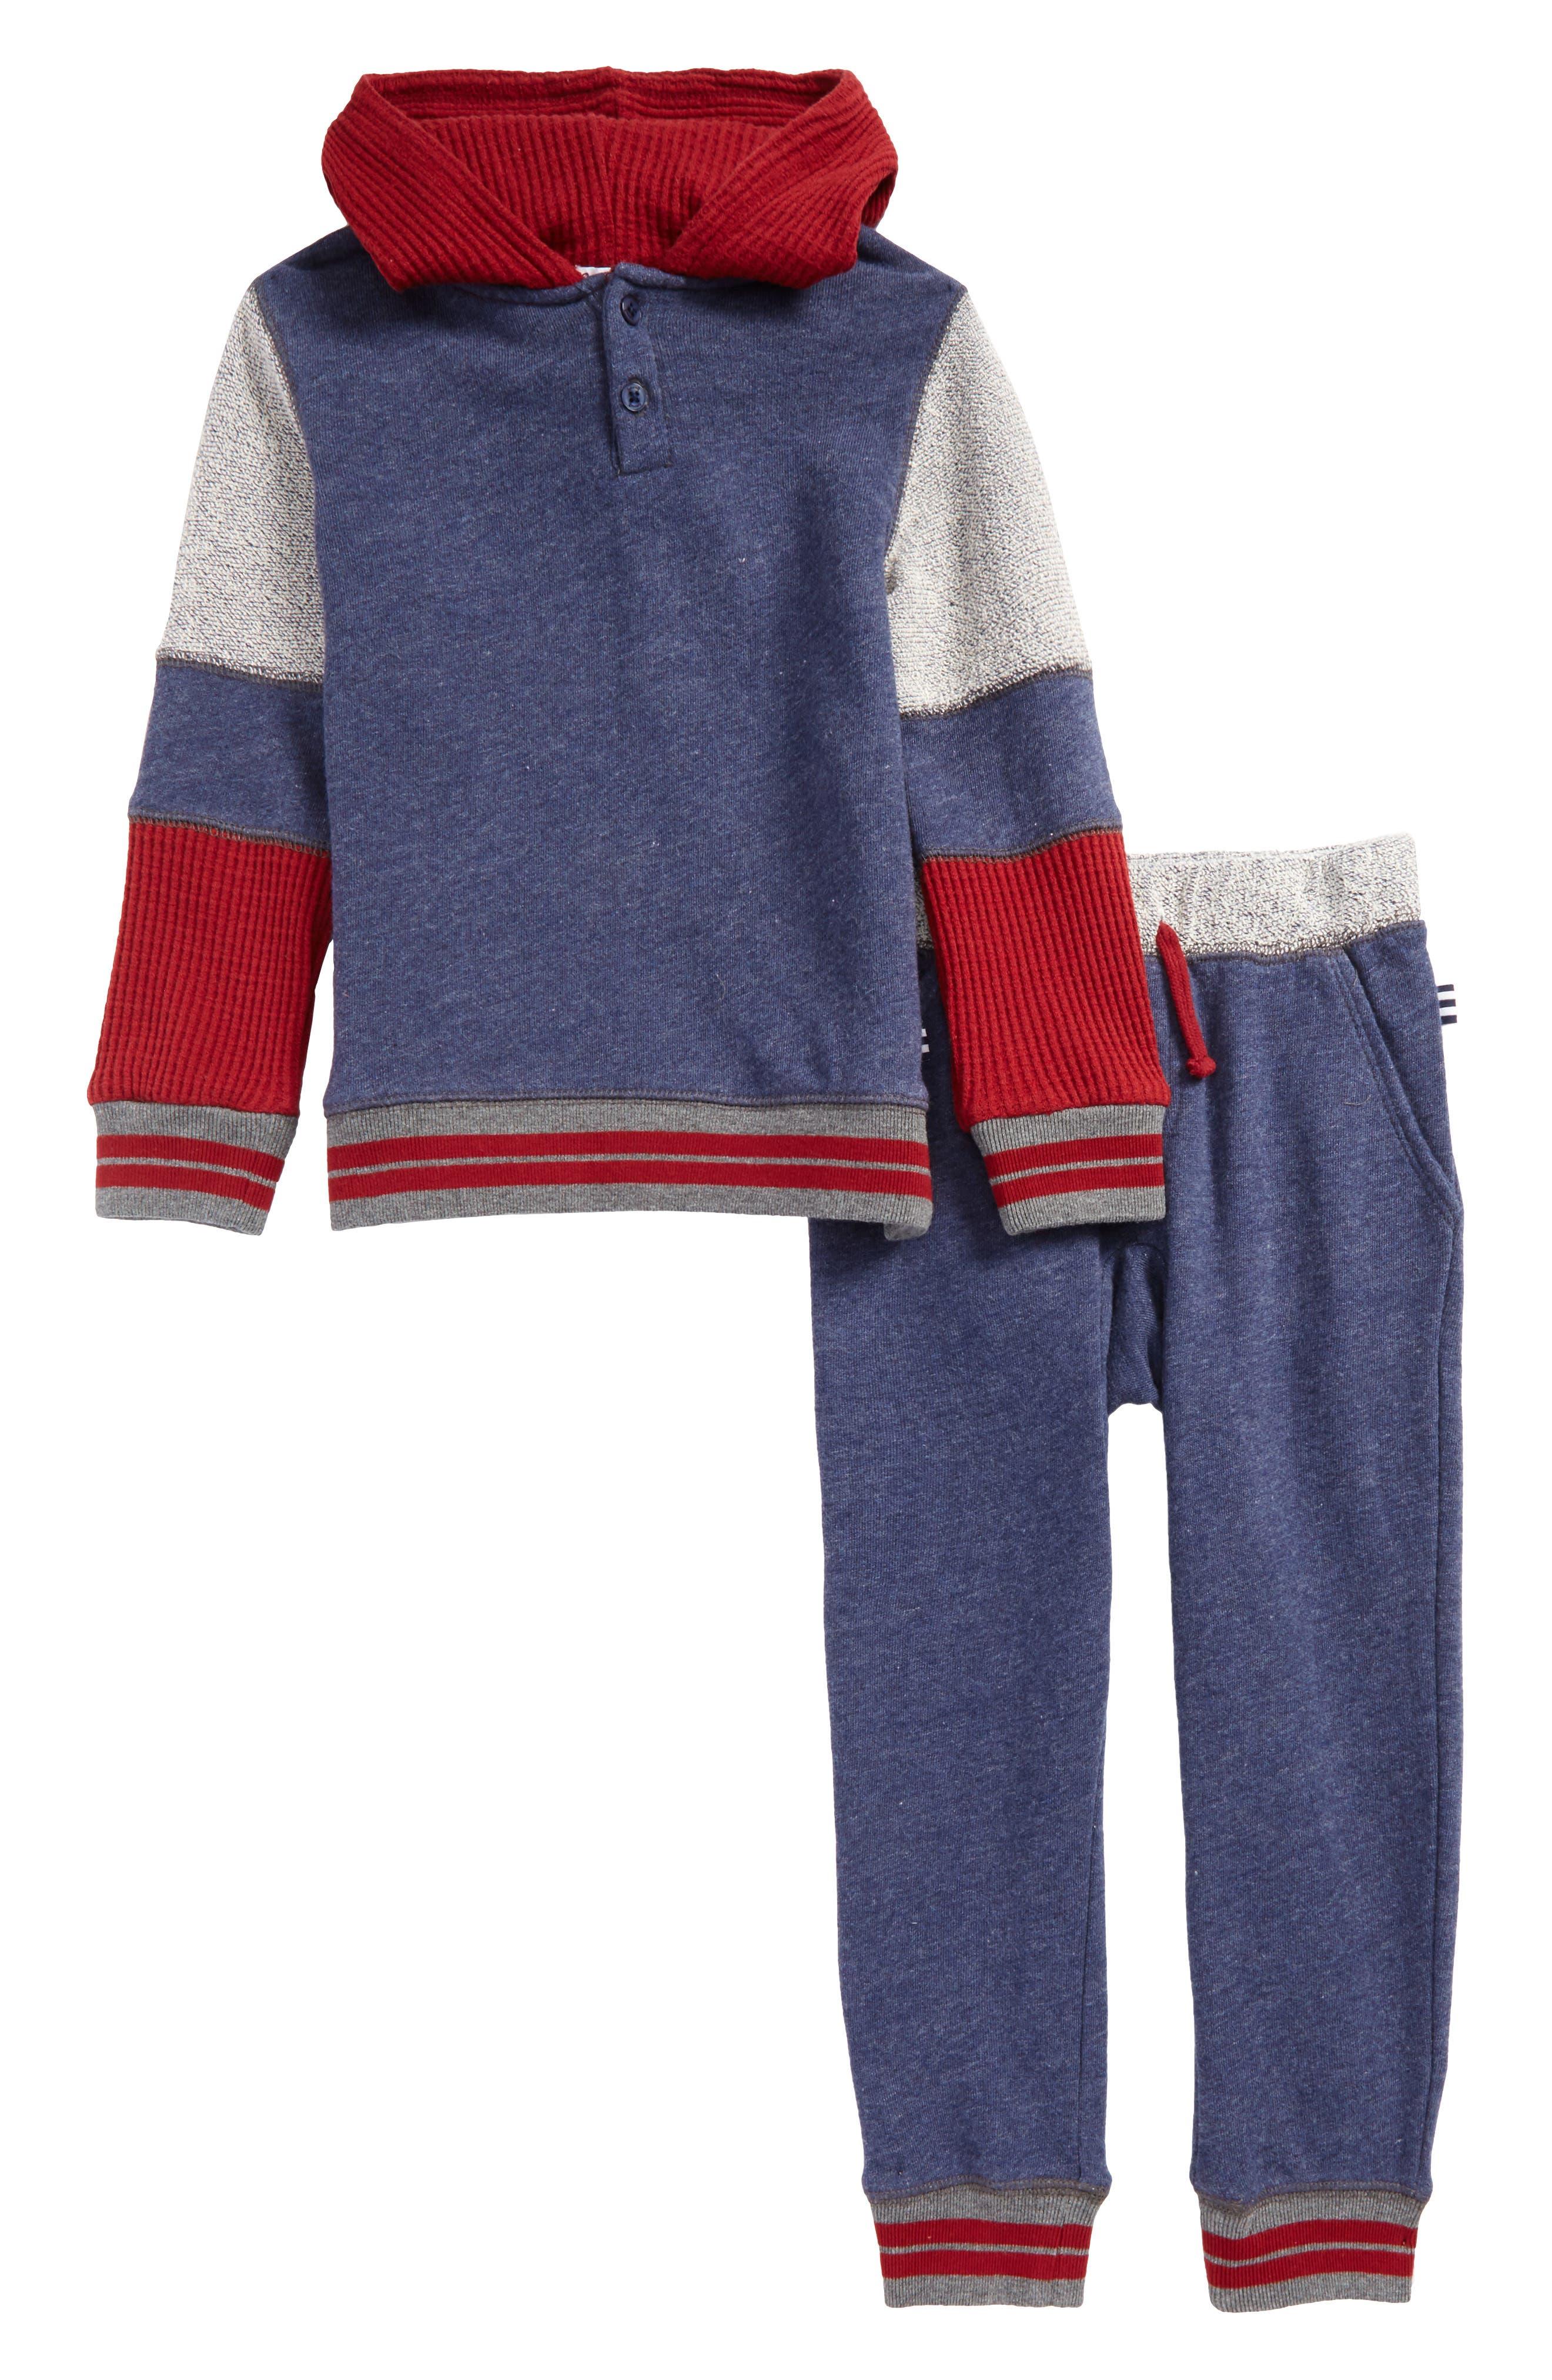 Alternate Image 1 Selected - Splendid Mixed Media Hoodie & Sweatpants Set (Toddler Boys & Little Boys)